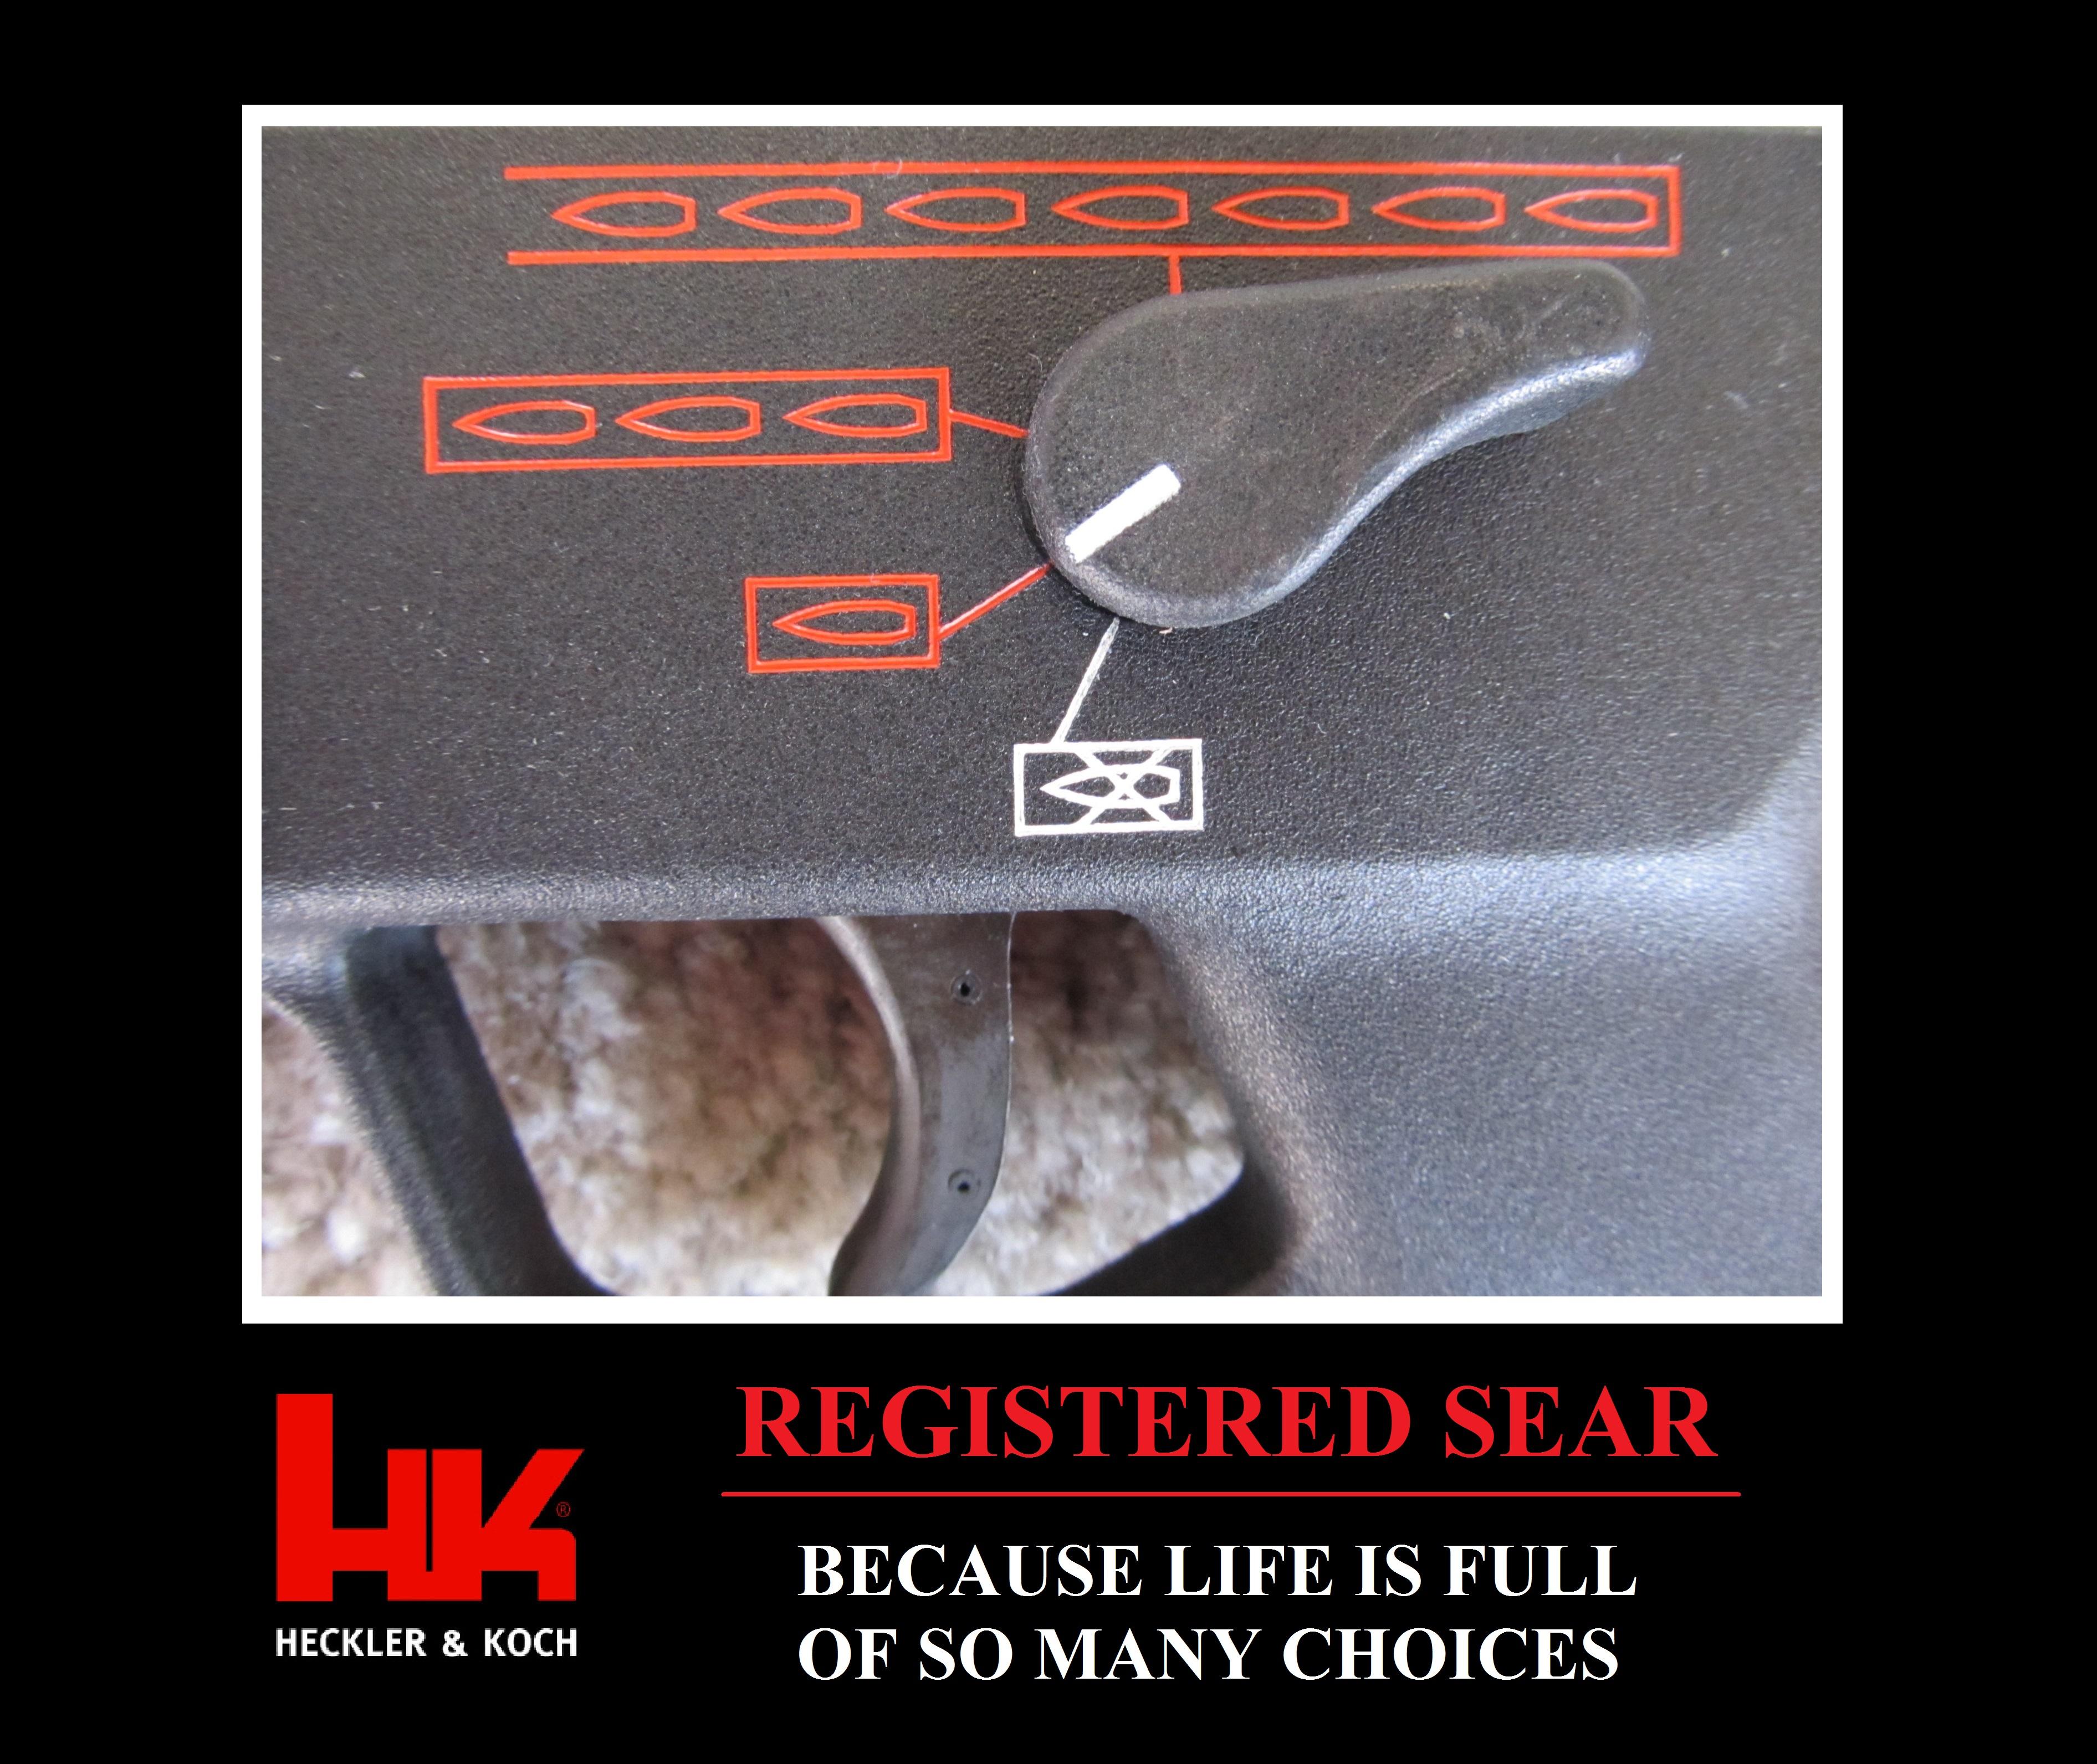 HK53 registered sear gun broker semi low buy it now-img_0928.1.jpg